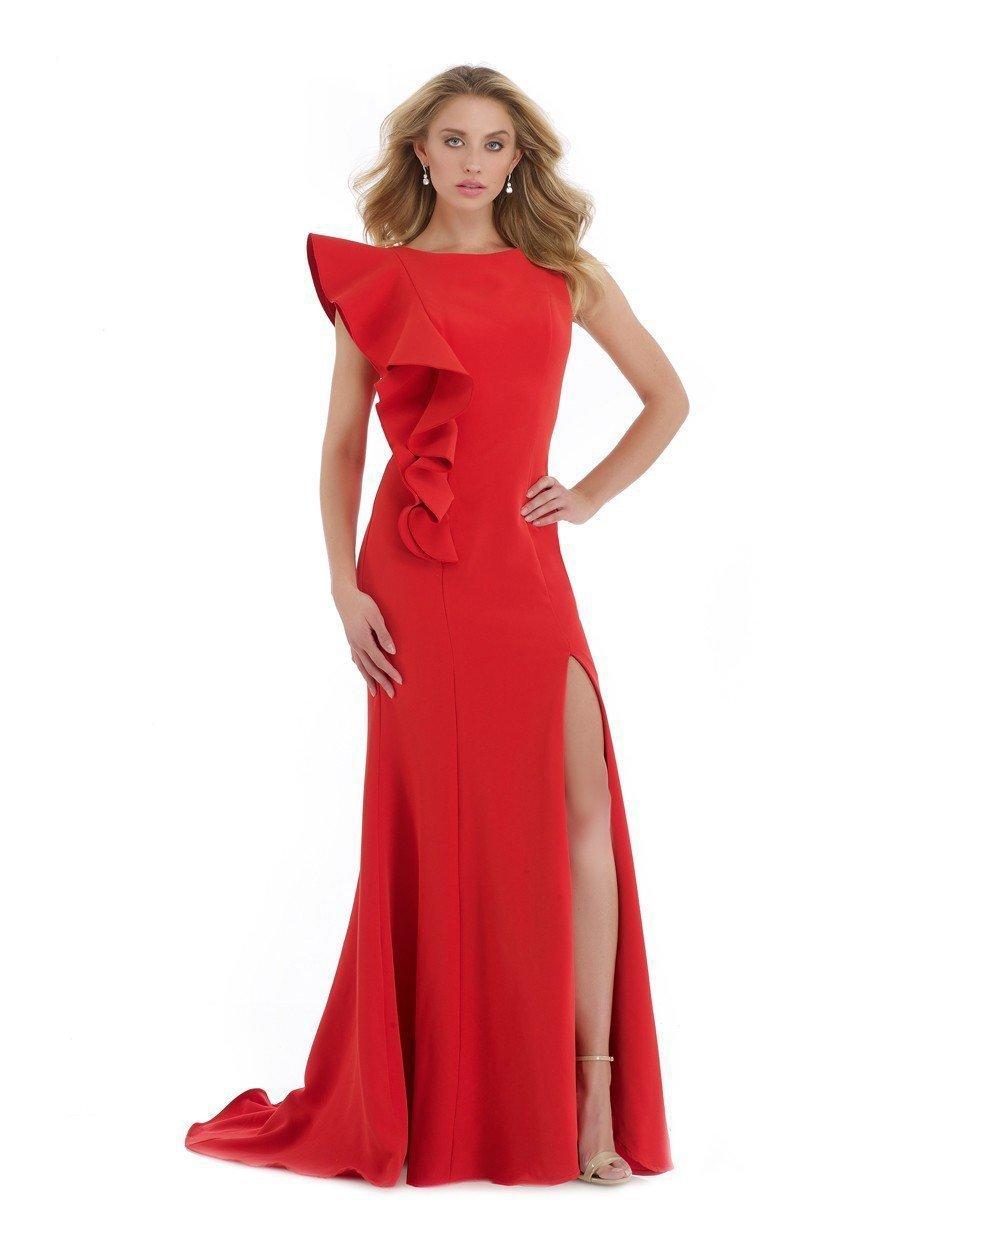 Morrell Maxie - 16063 Ruffled Bateau Sheath Evening Dress